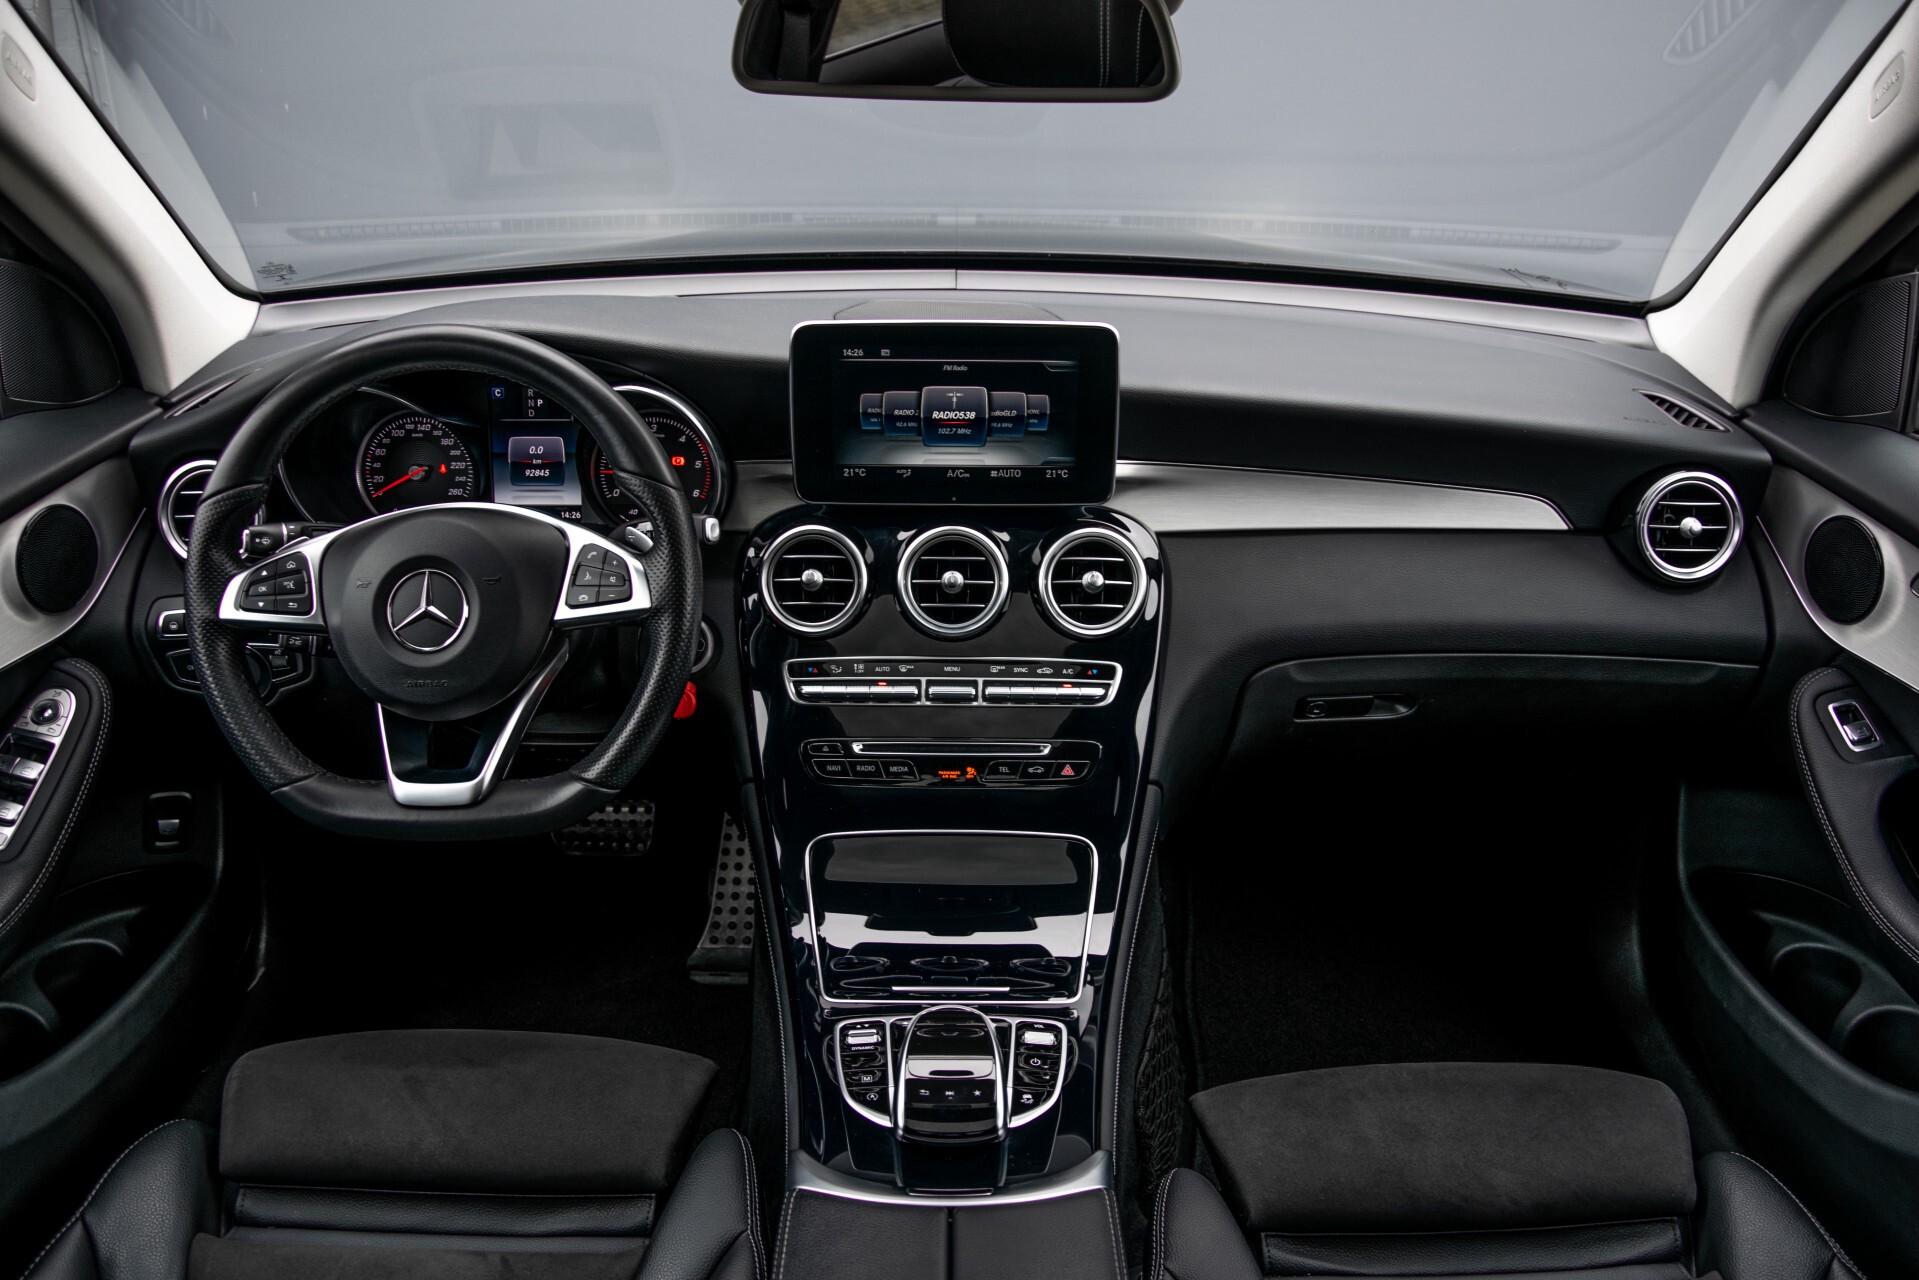 Mercedes-Benz GLC 220 d 4-M AMG/Distronic/Panorama/Comand/HUD/Afn-Trhk Aut9 Foto 7